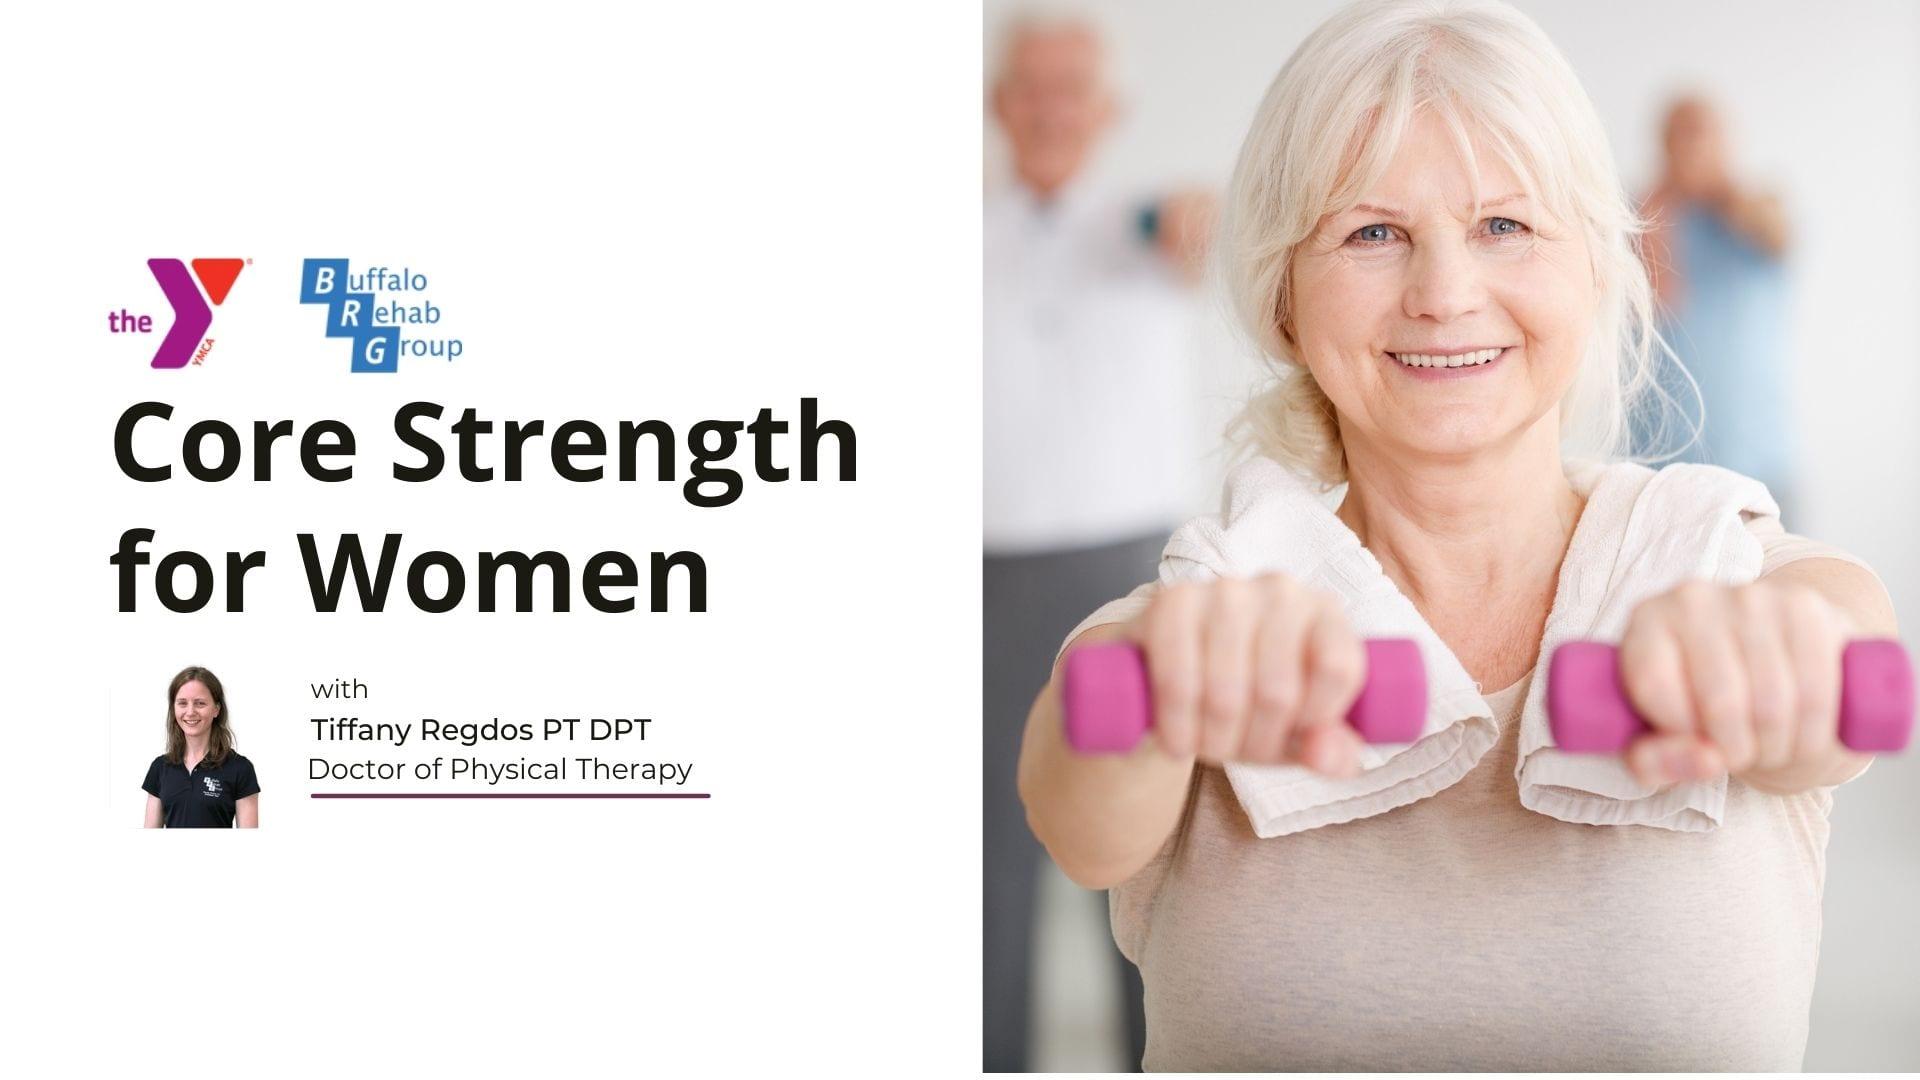 Core strength for women class